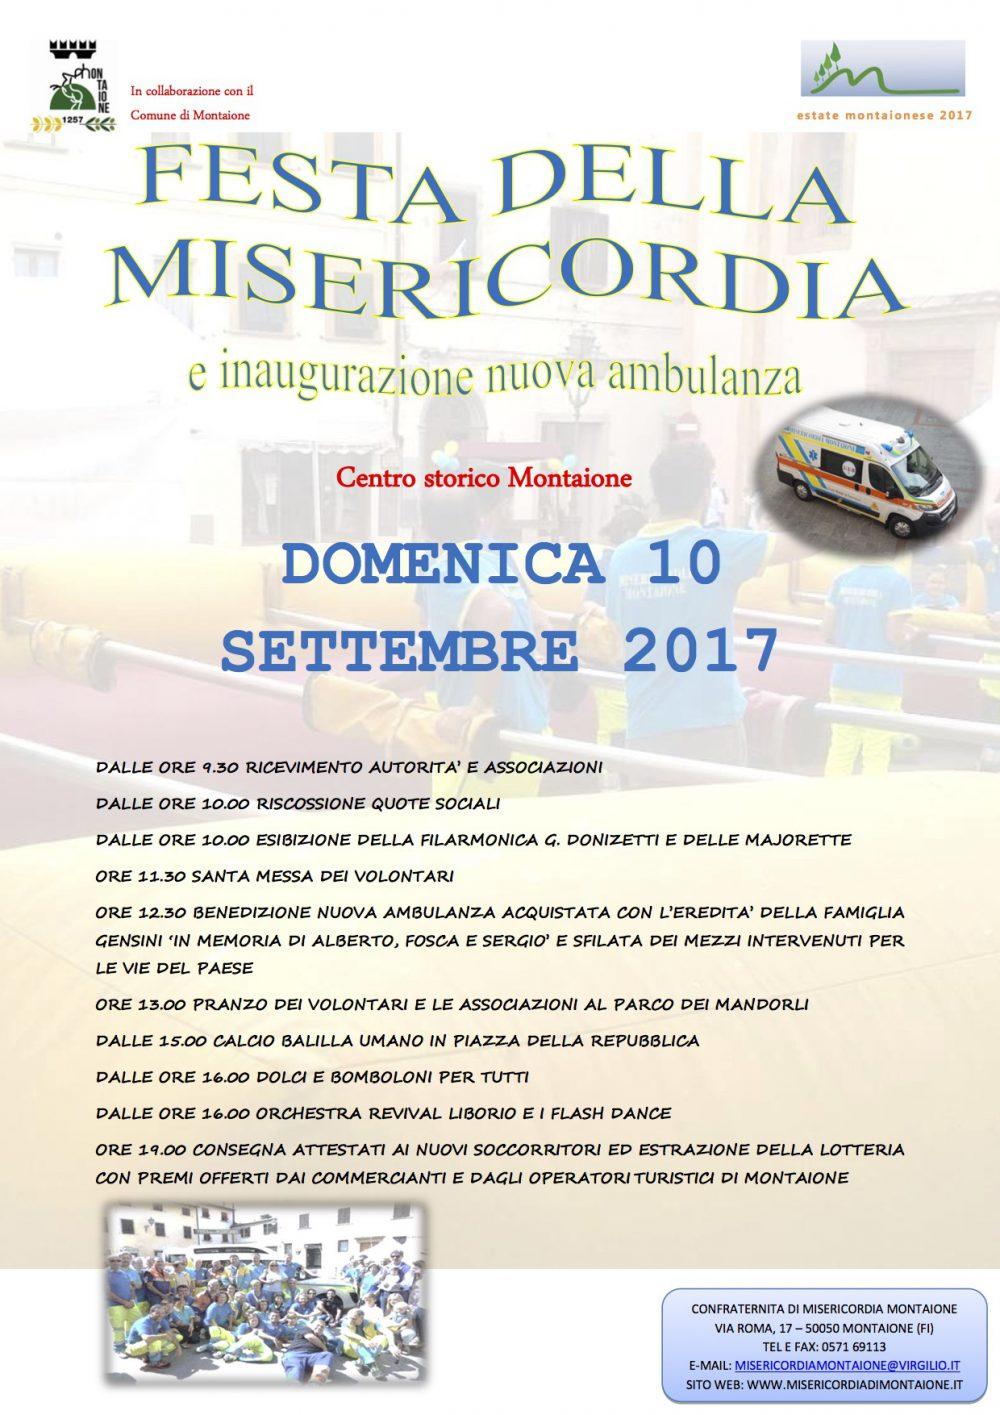 festaMisericordia2017